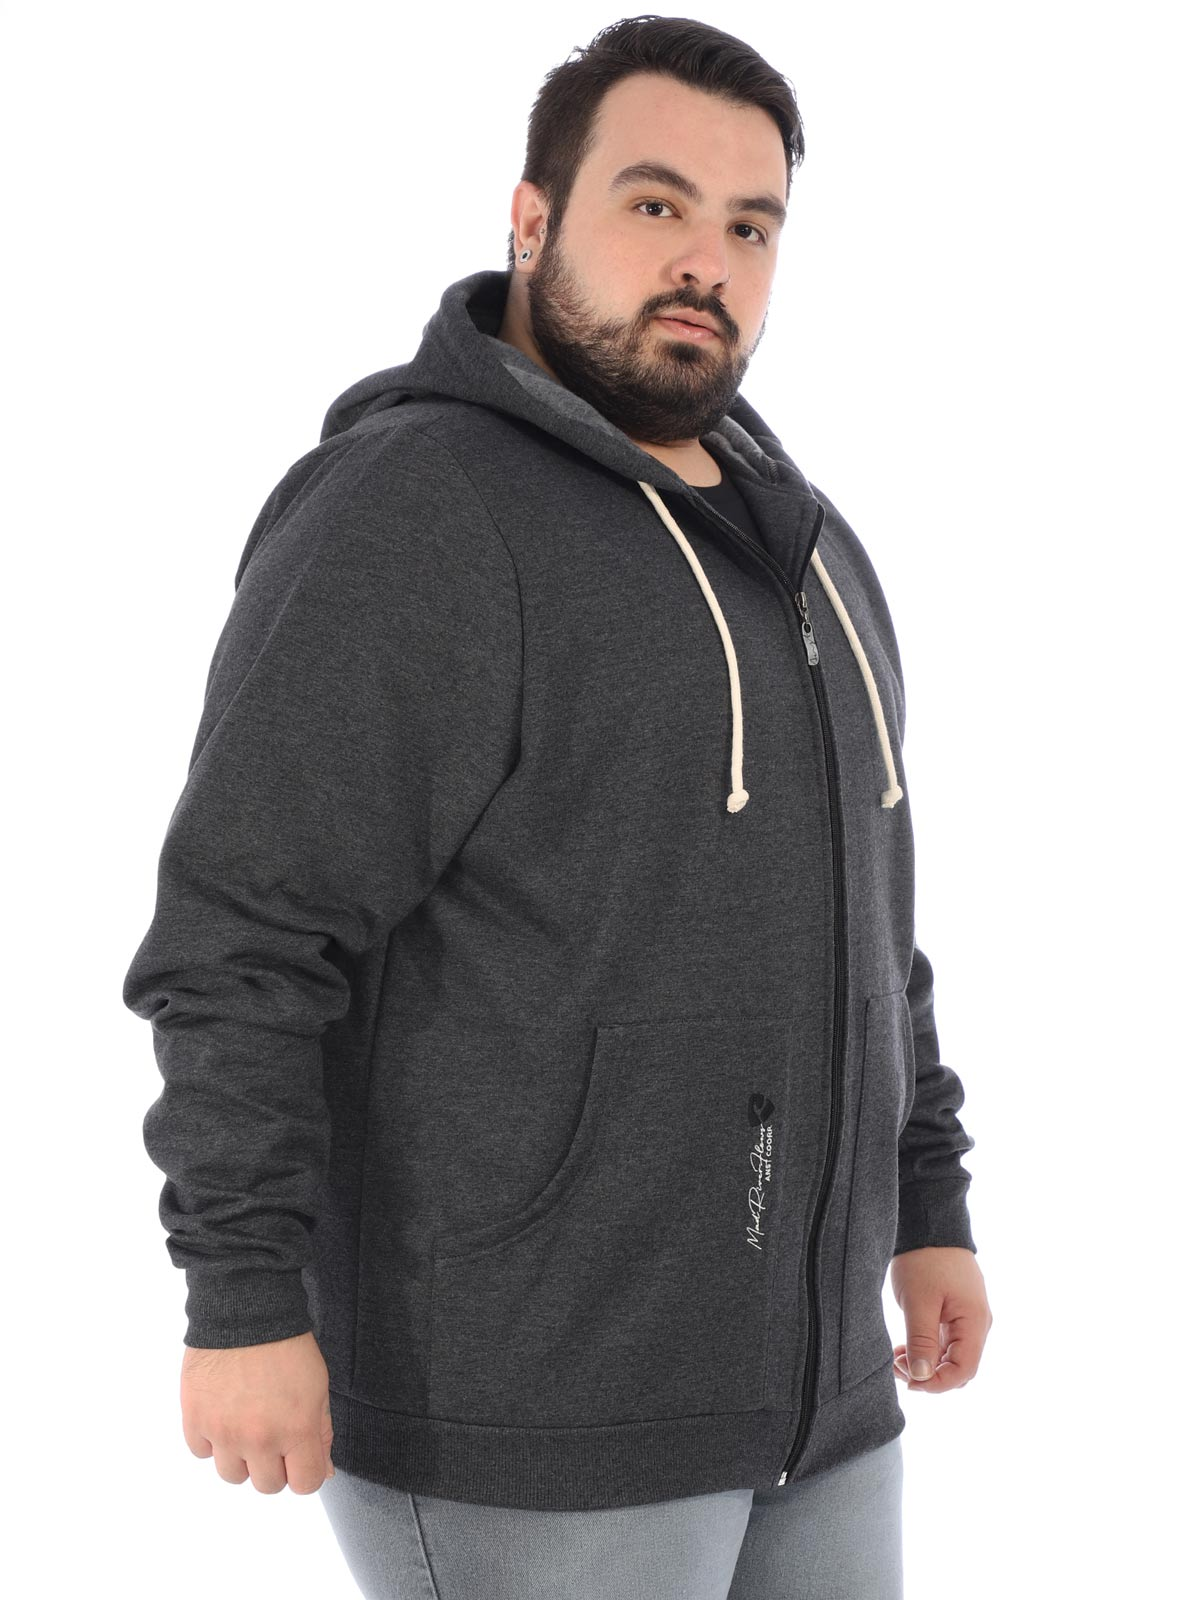 Jaqueta Plus Size Masculino Moletom Flanelado Capuz Mescla